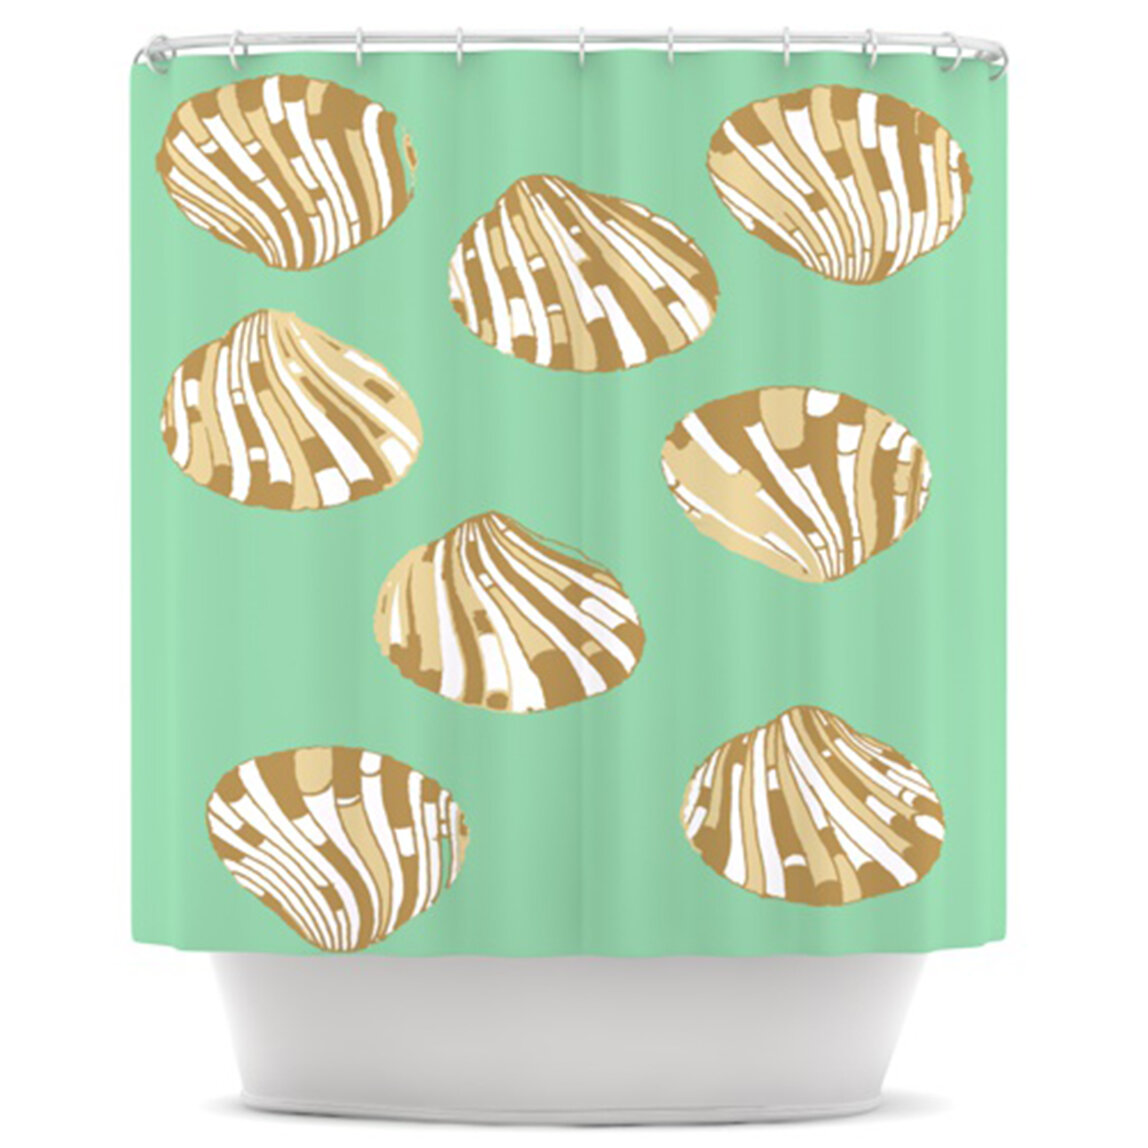 KESS InHouse Scallop Shells Shower Curtain